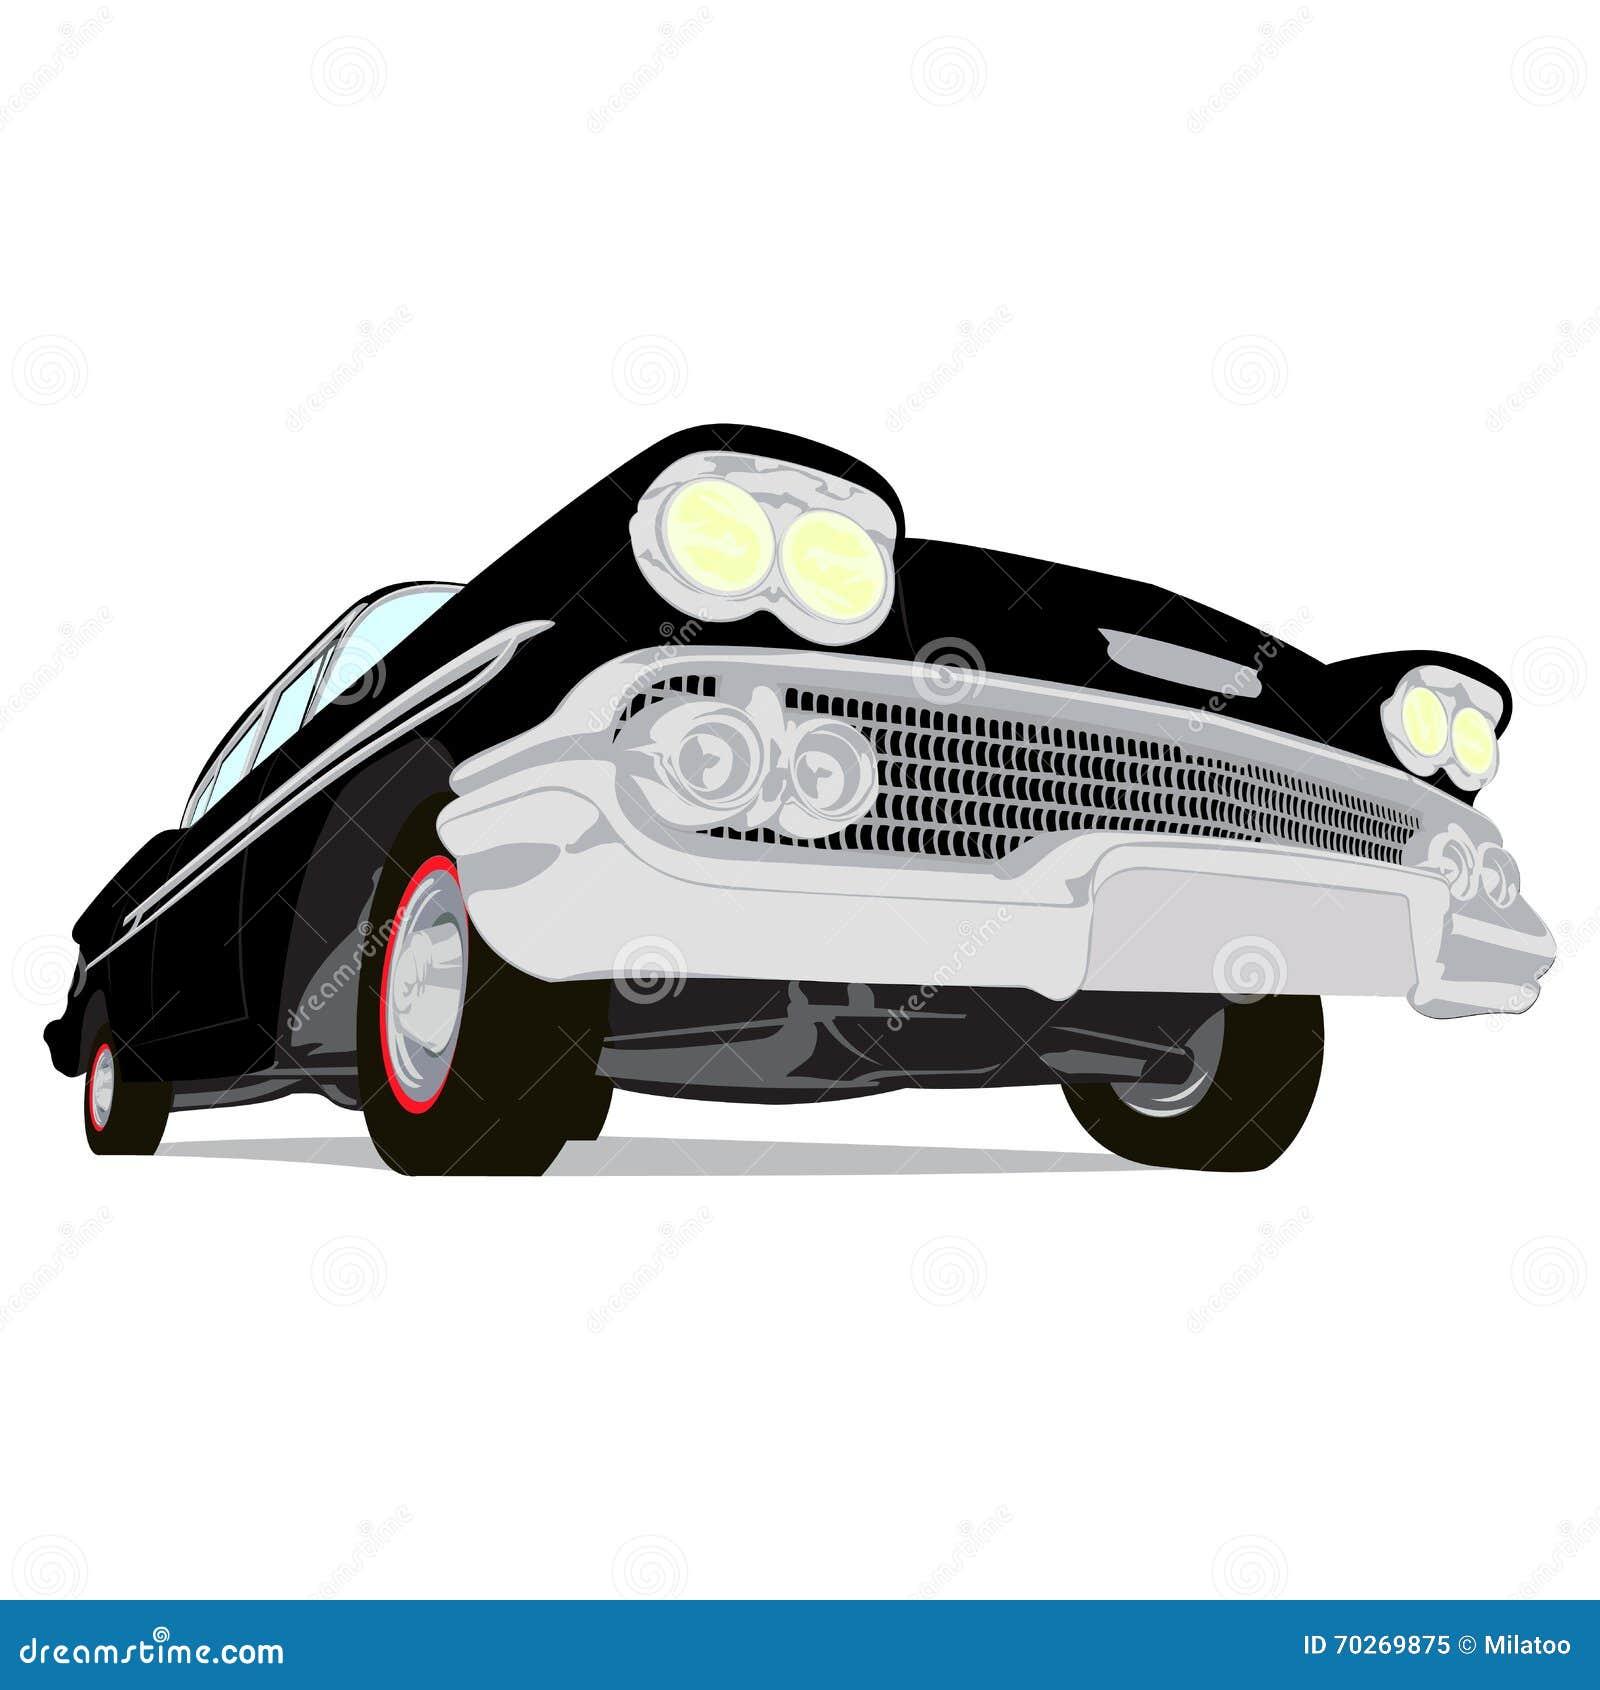 Esboco Dos Desenhos Animados Dos Carros Do Musculo Do Vintage